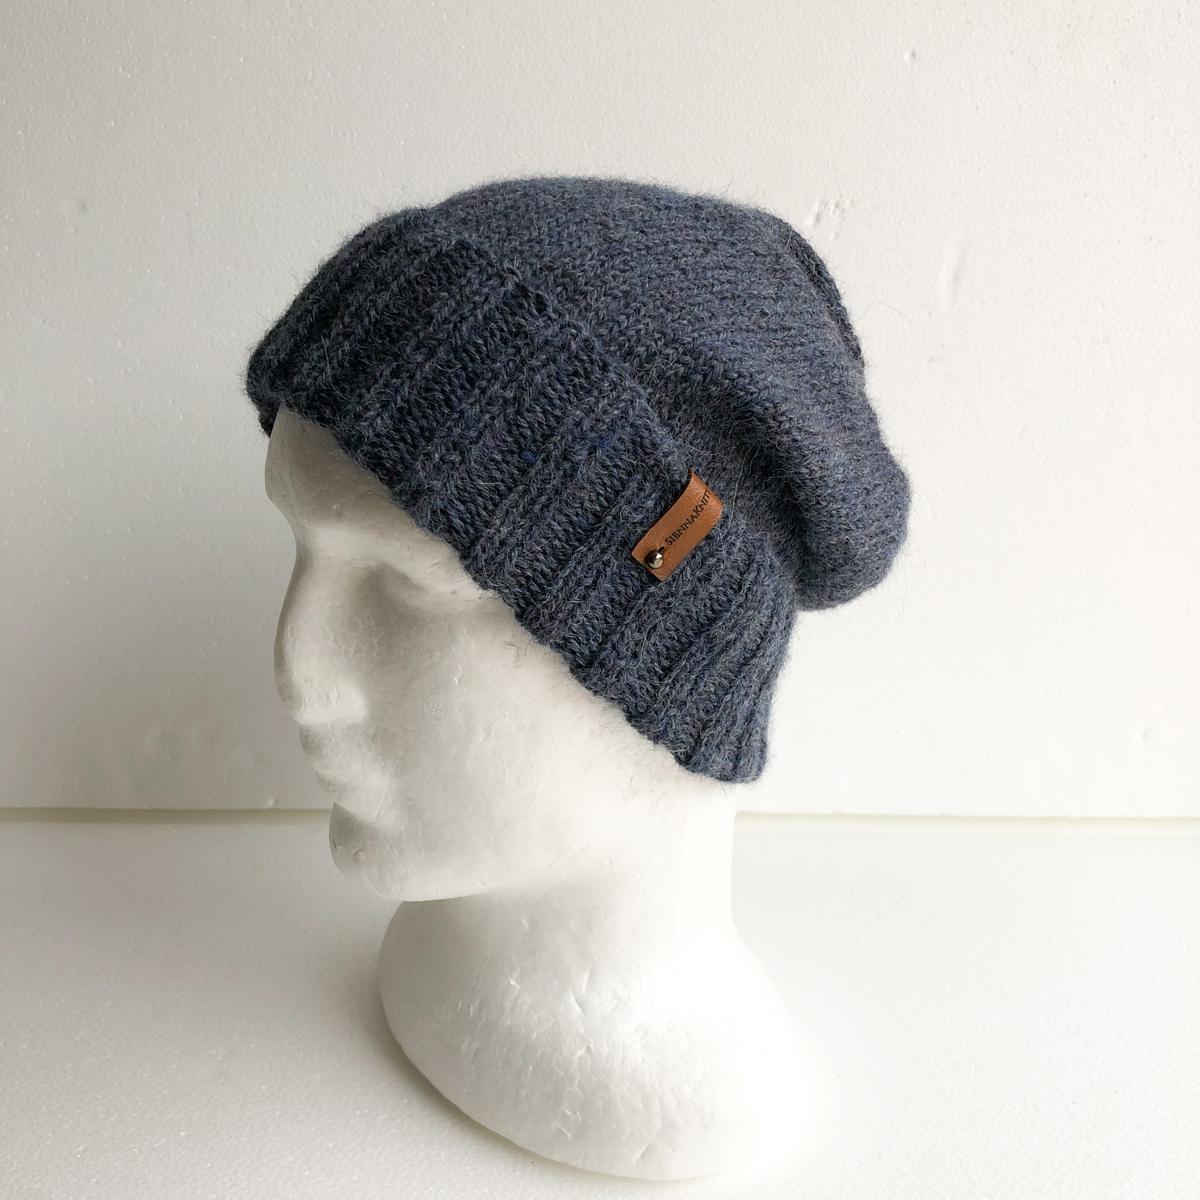 100% Alpaca Blue-Grey Knit Unisex Beanie With Foldable Brim By SiennaKnits